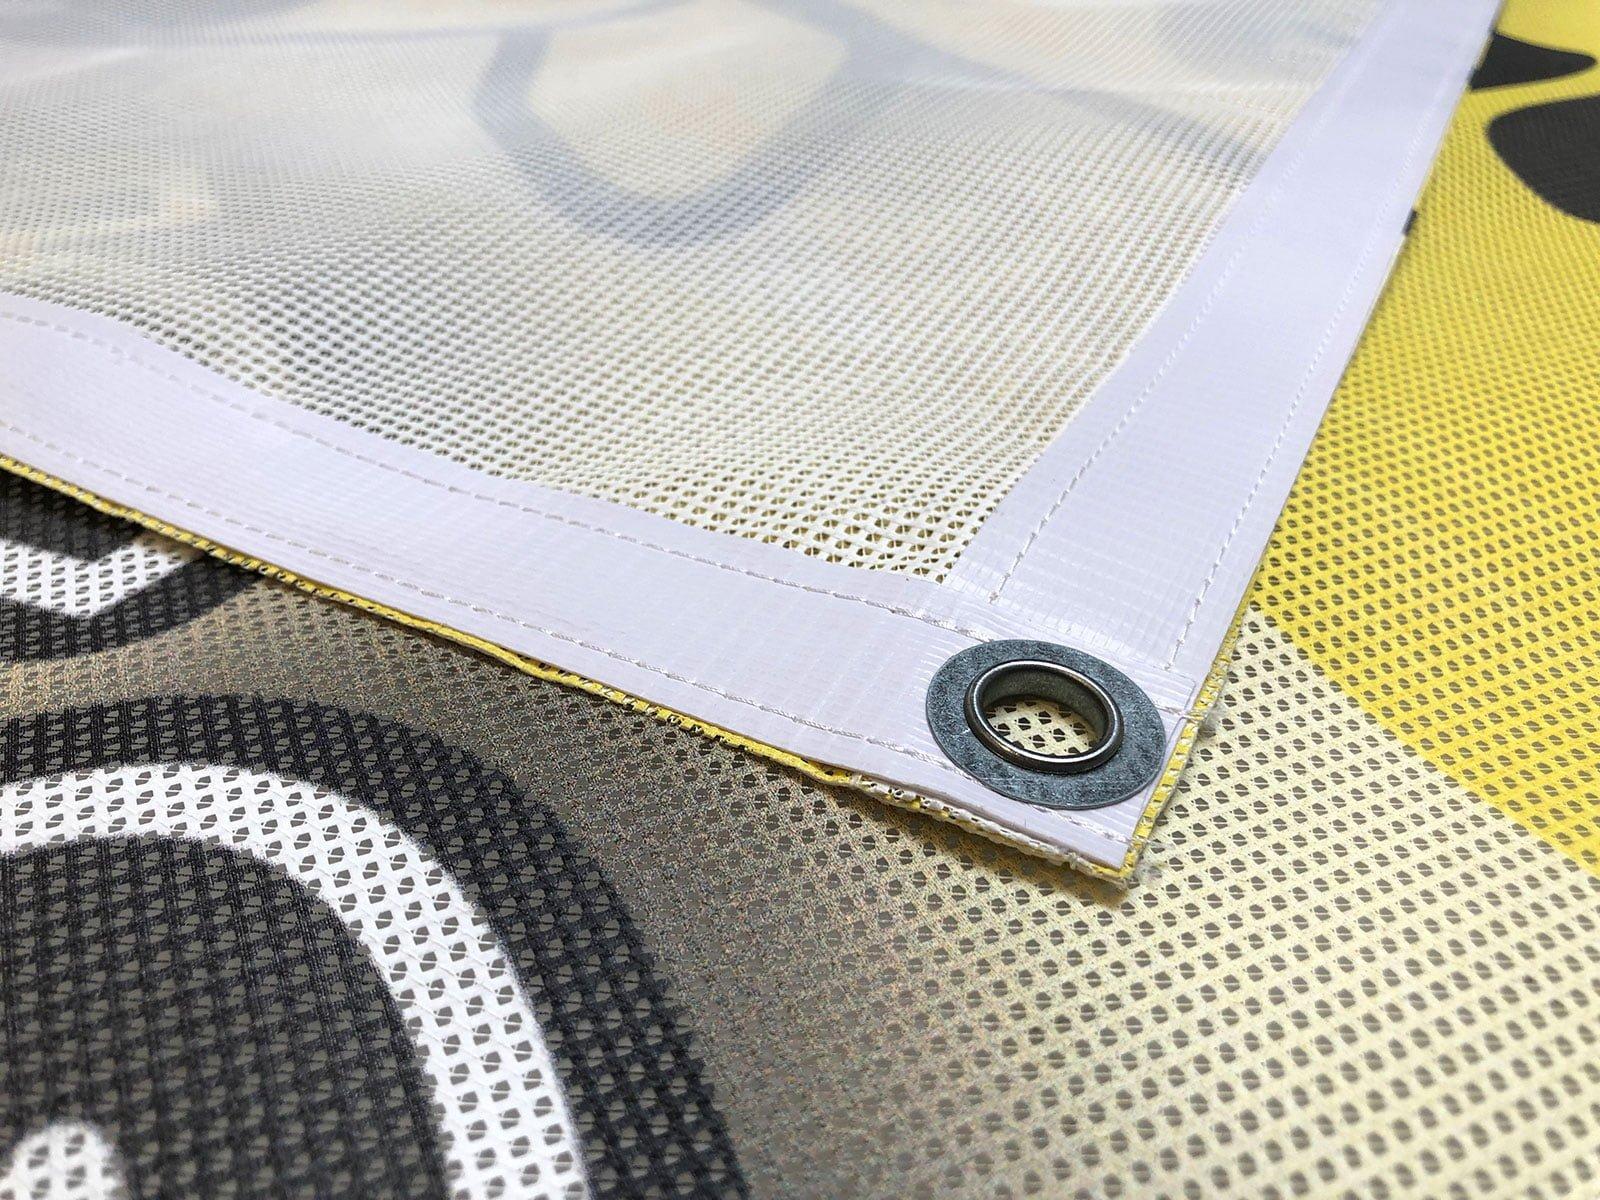 Please Come Again Nostalgia Stripes Wind-Resistant Outdoor Mesh Vinyl Banner 9x6 CGSignLab